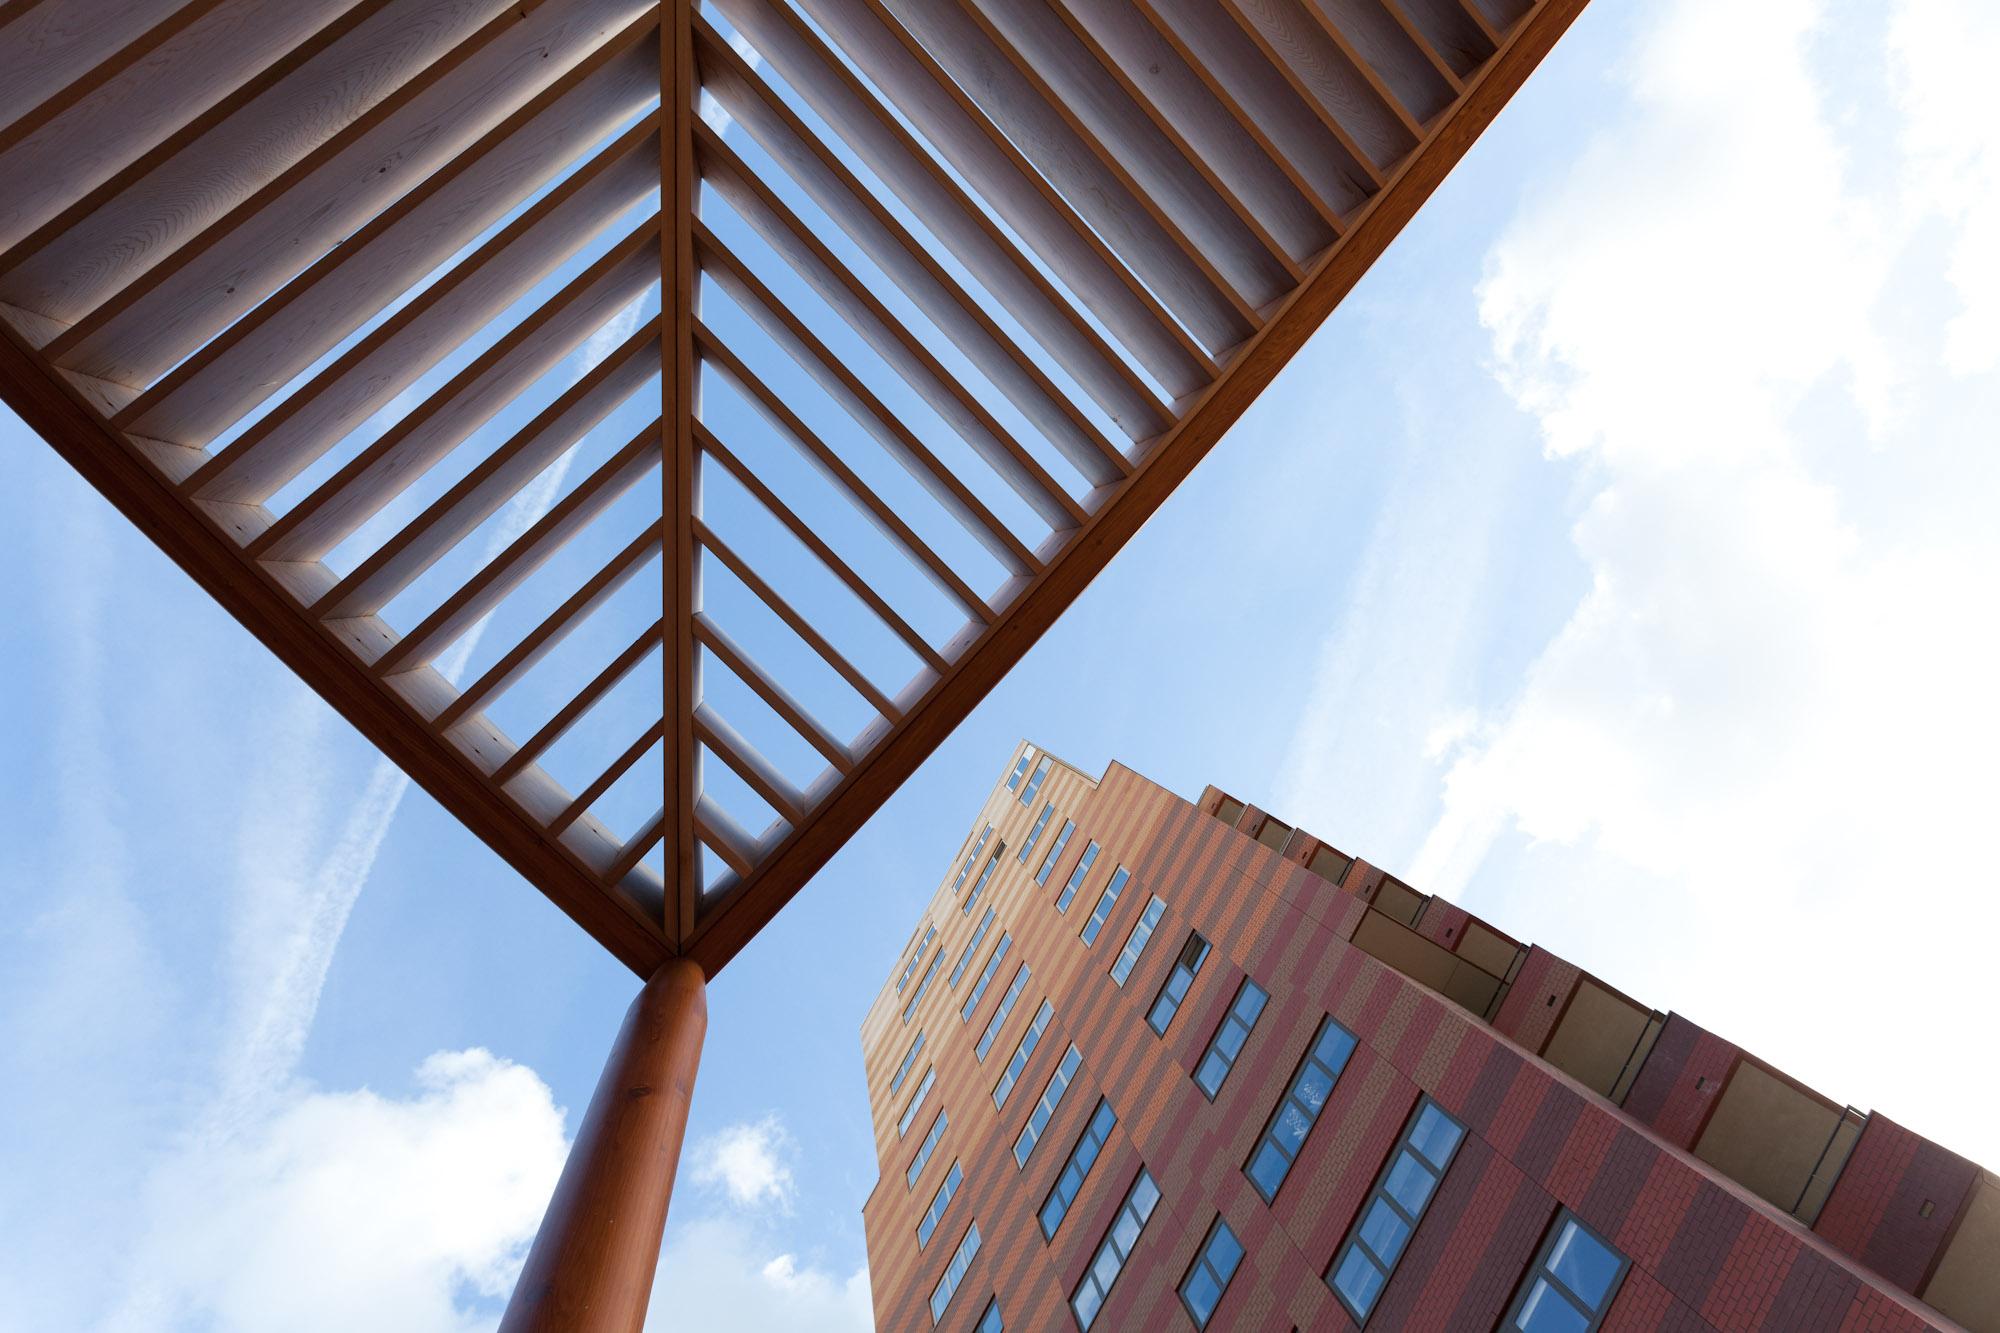 pavilion_amsterdam_emiel_lamers_lowres-5.jpg